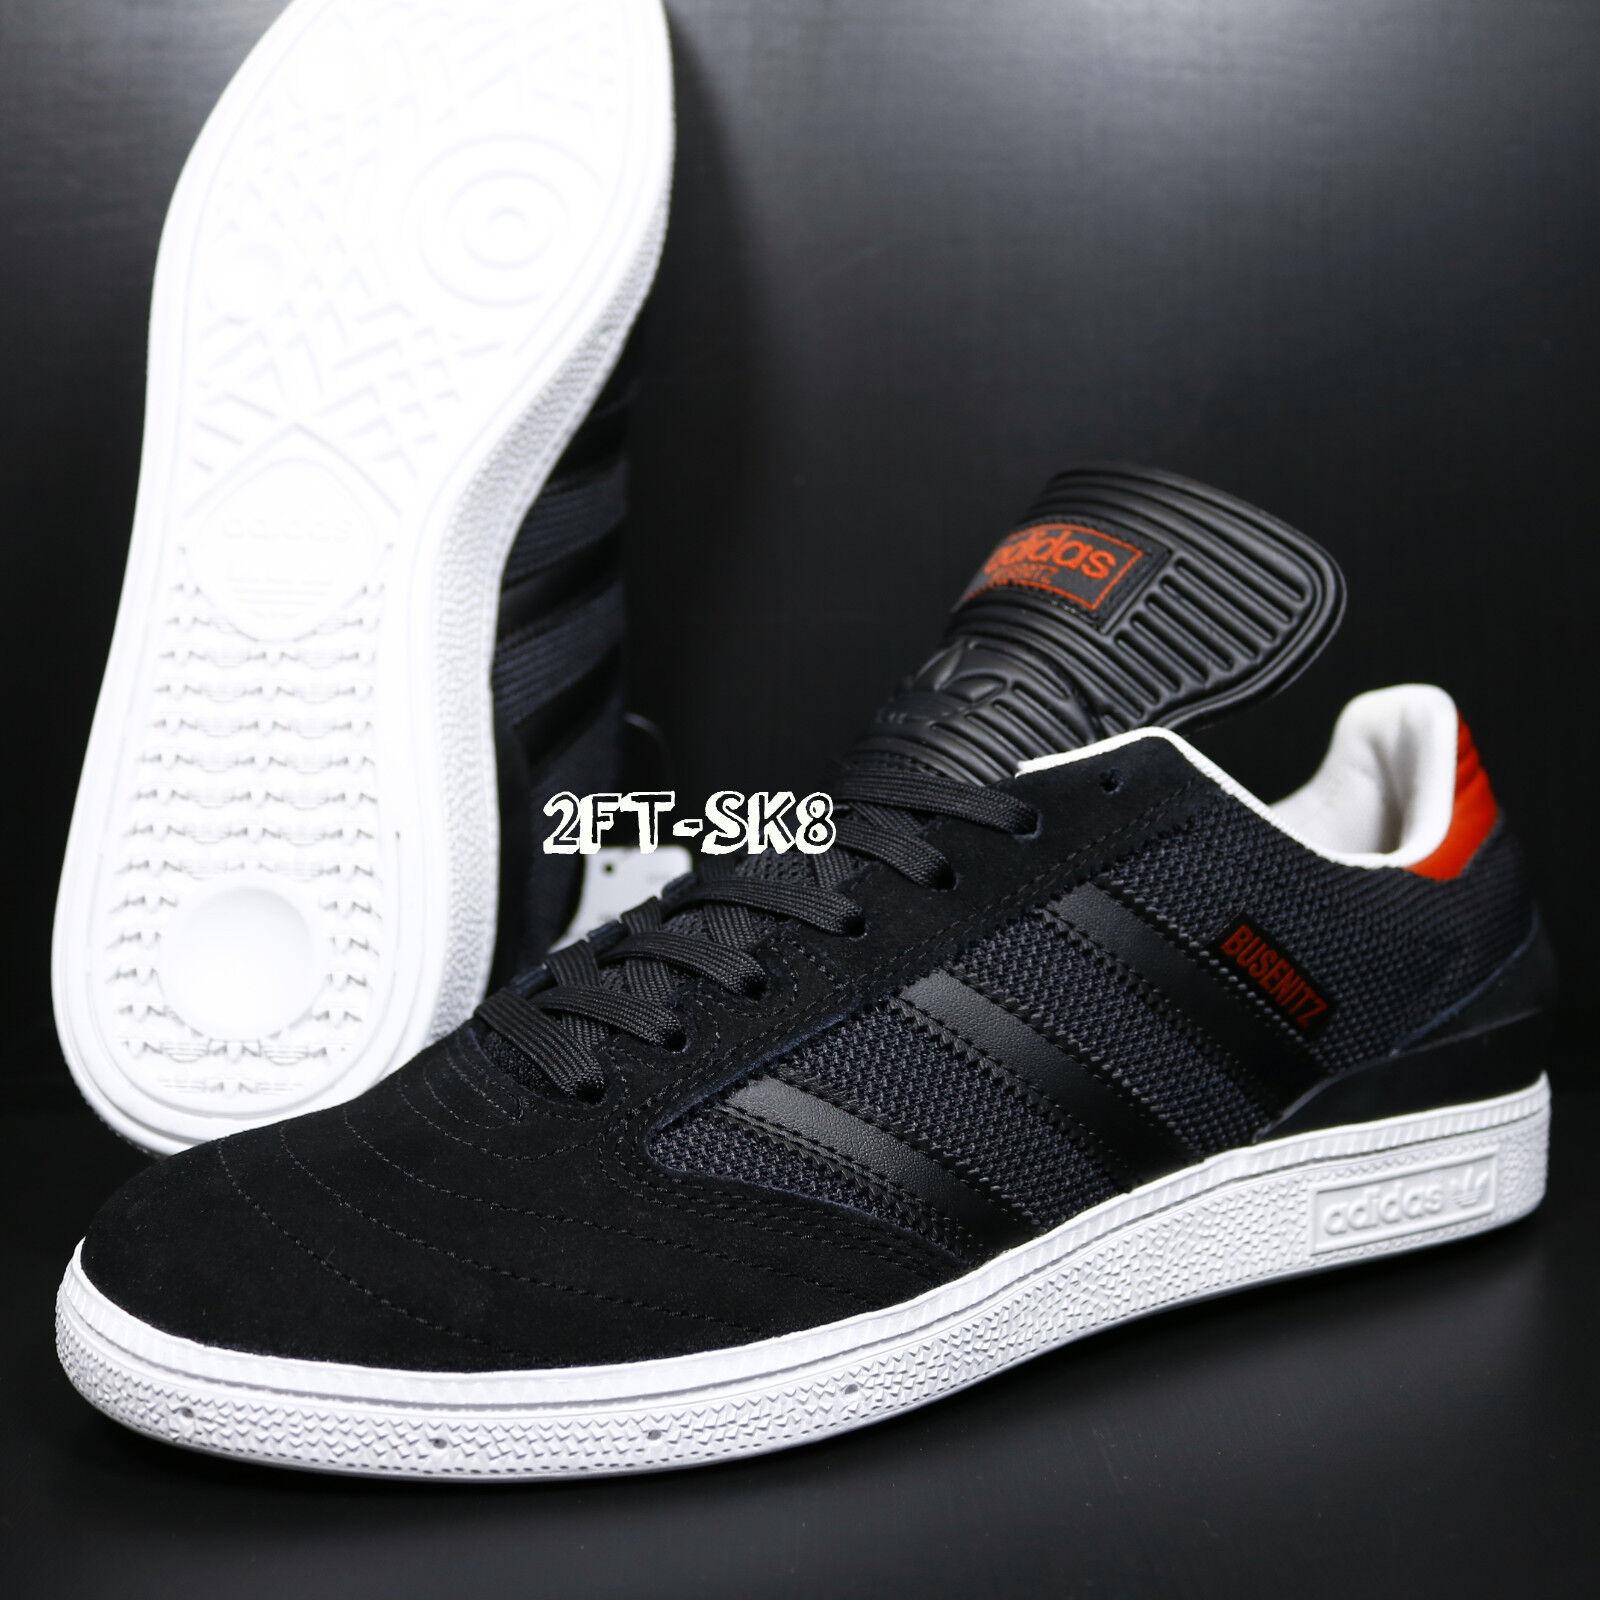 Adidas originals busenitz schwarz - weiß - / rote männer skate schuhe / - s81246.266 e6a43a